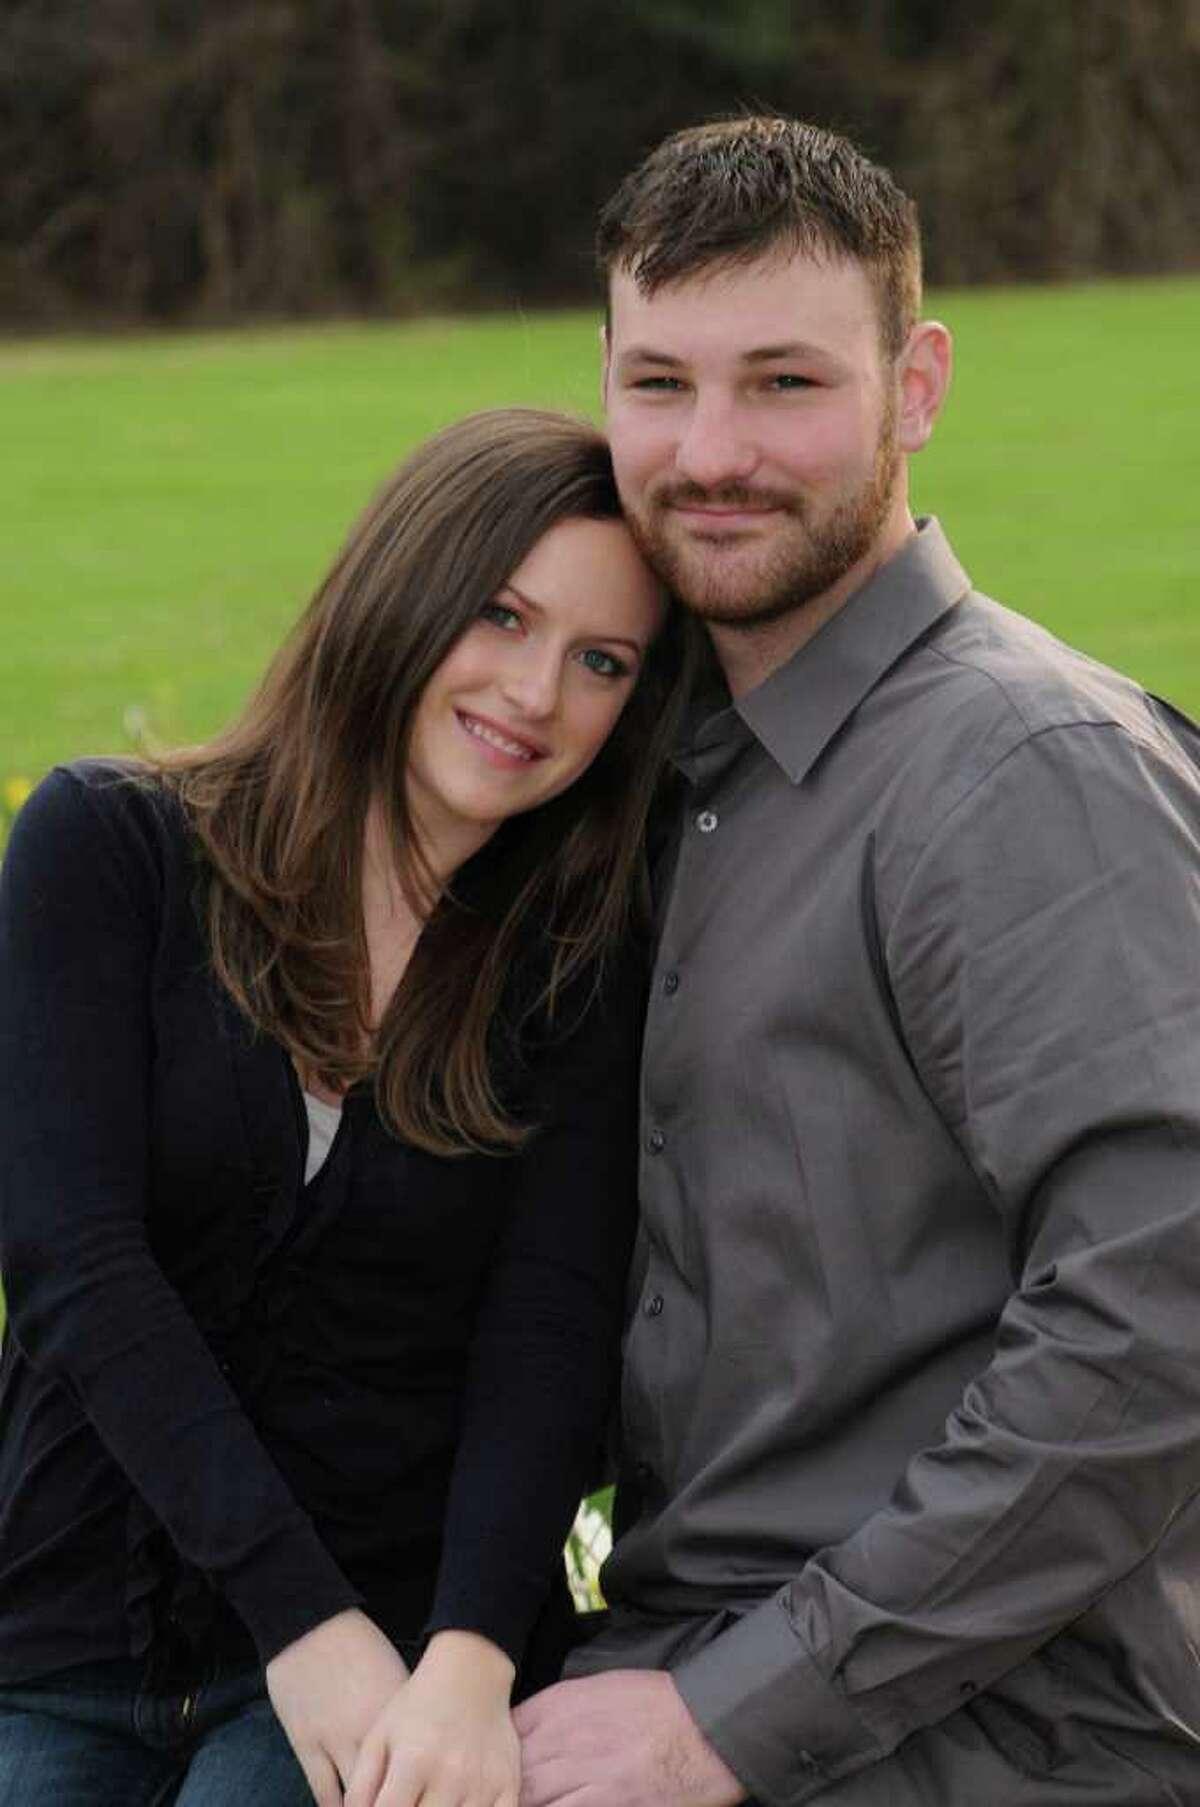 Laura Stewart and Jeffrey Rubino are engaged.